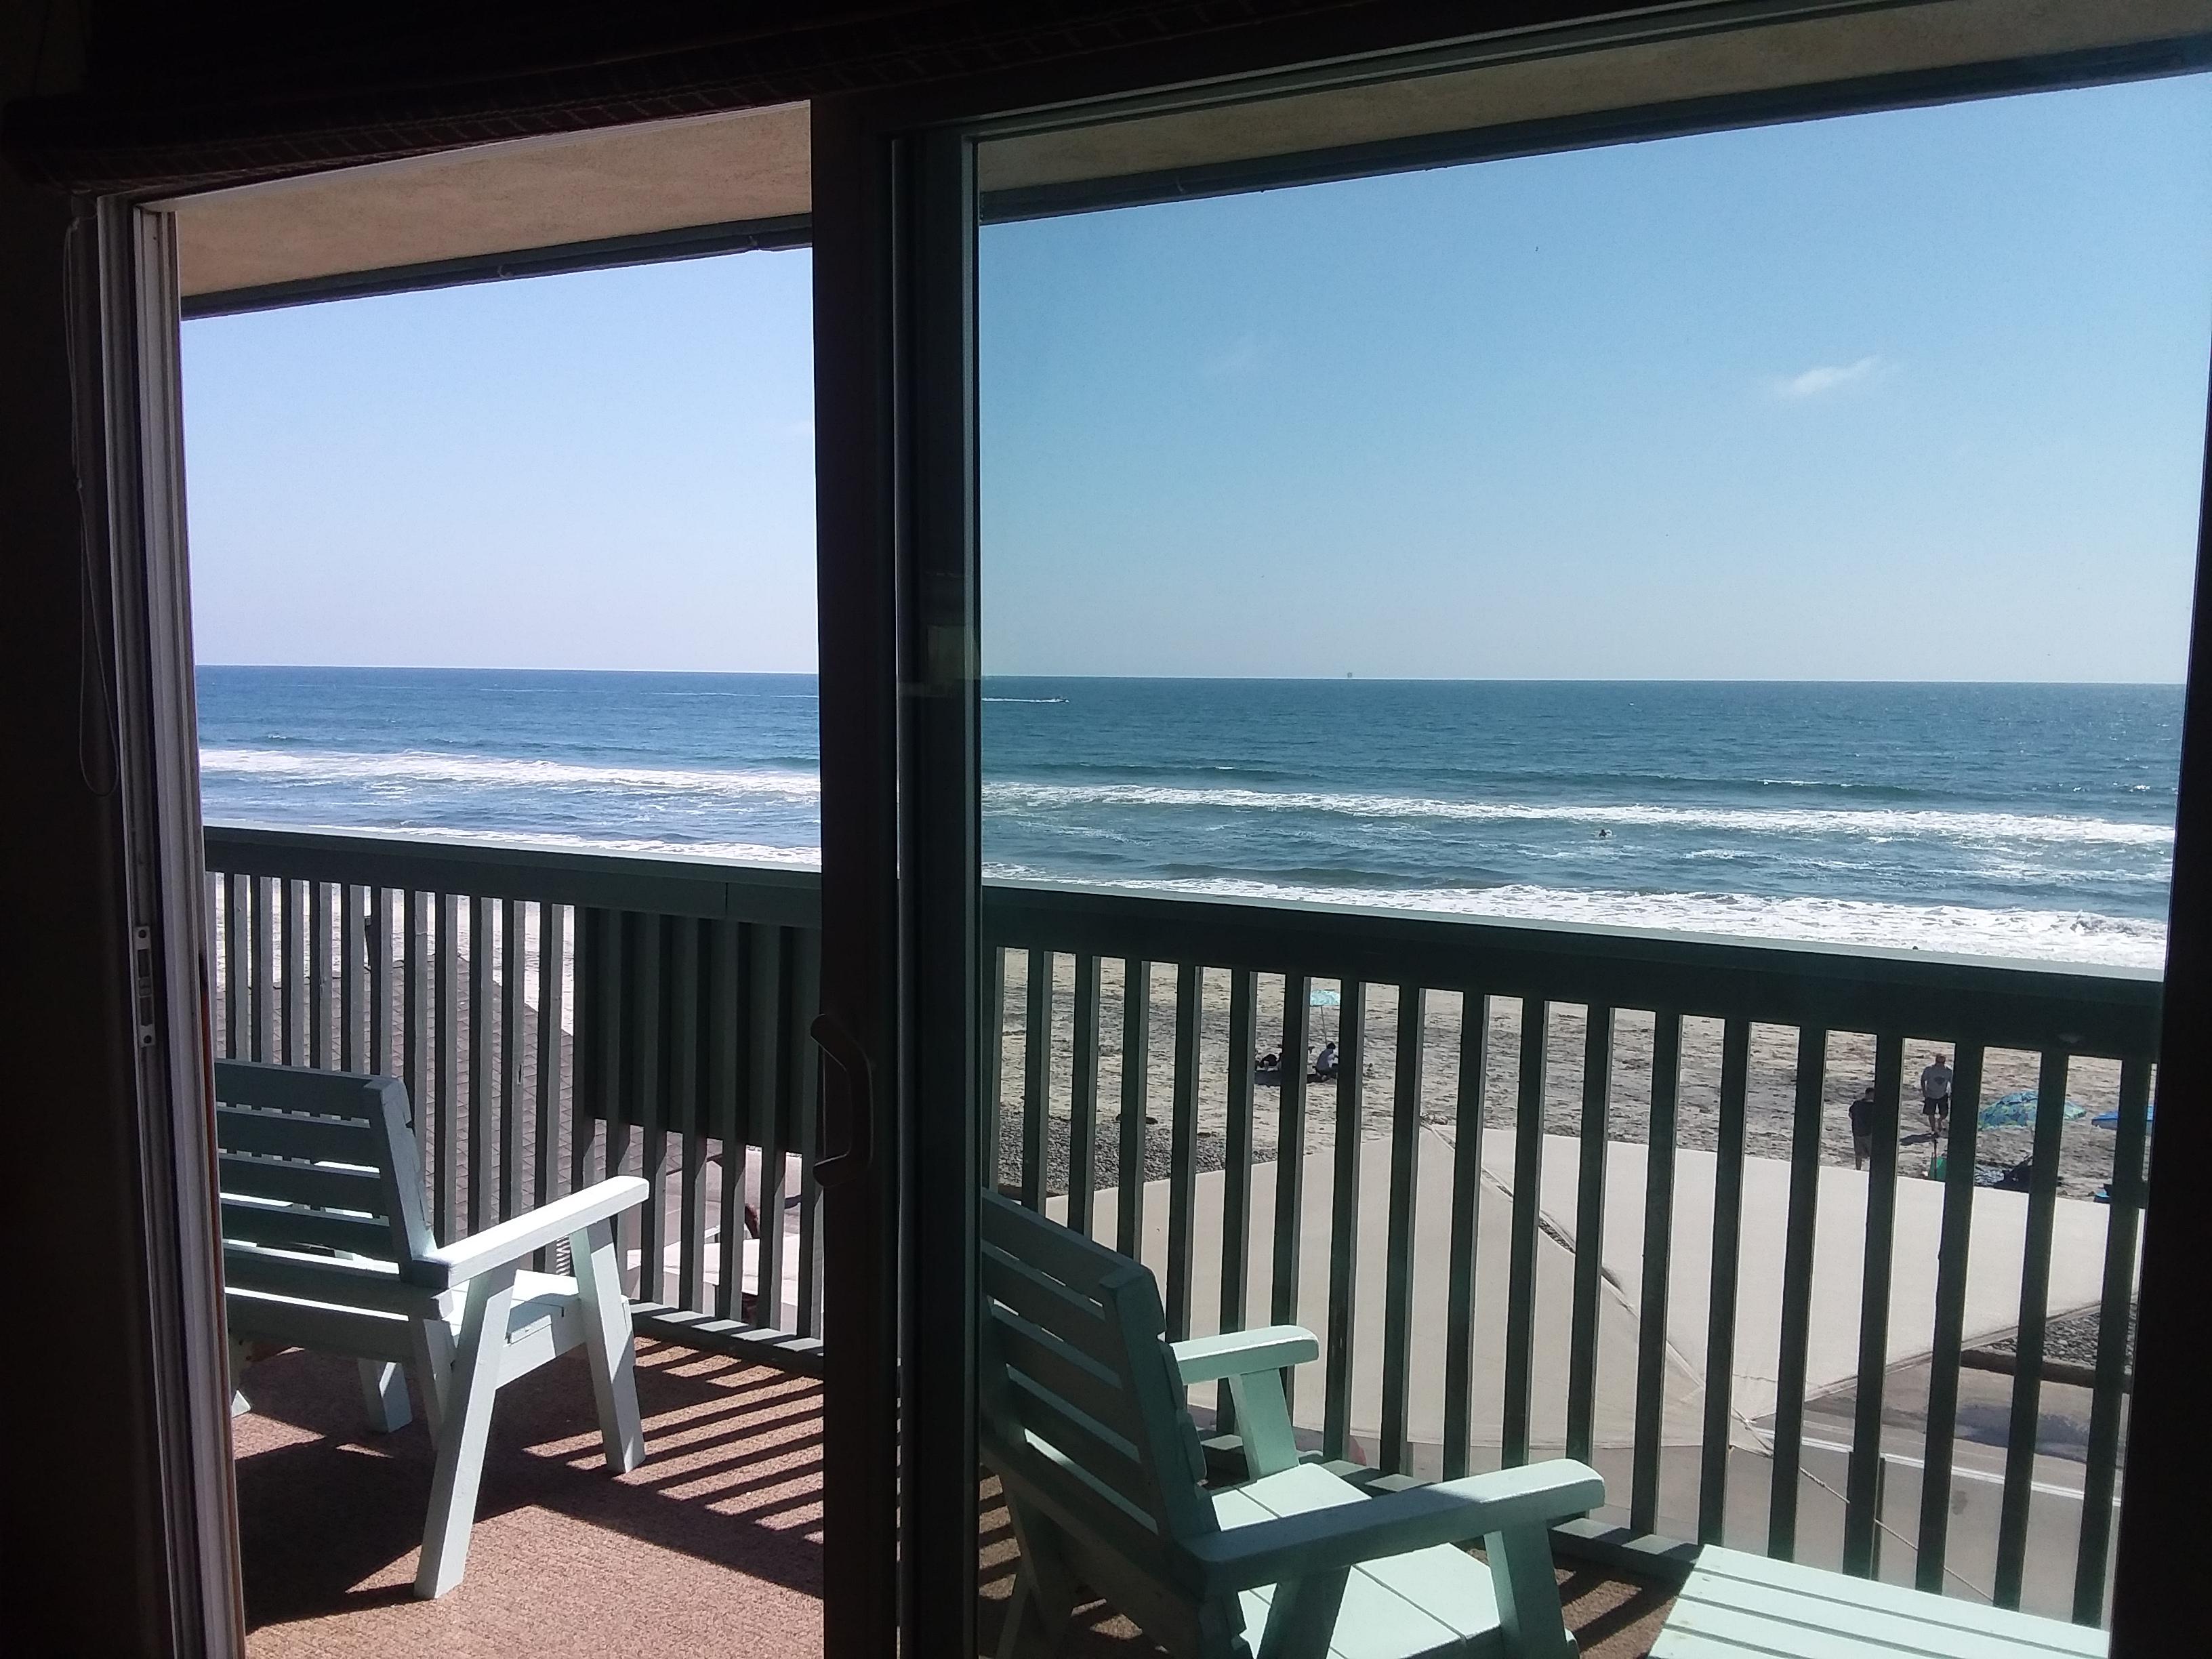 2 Bed Short Term Rental Apartment oceanside